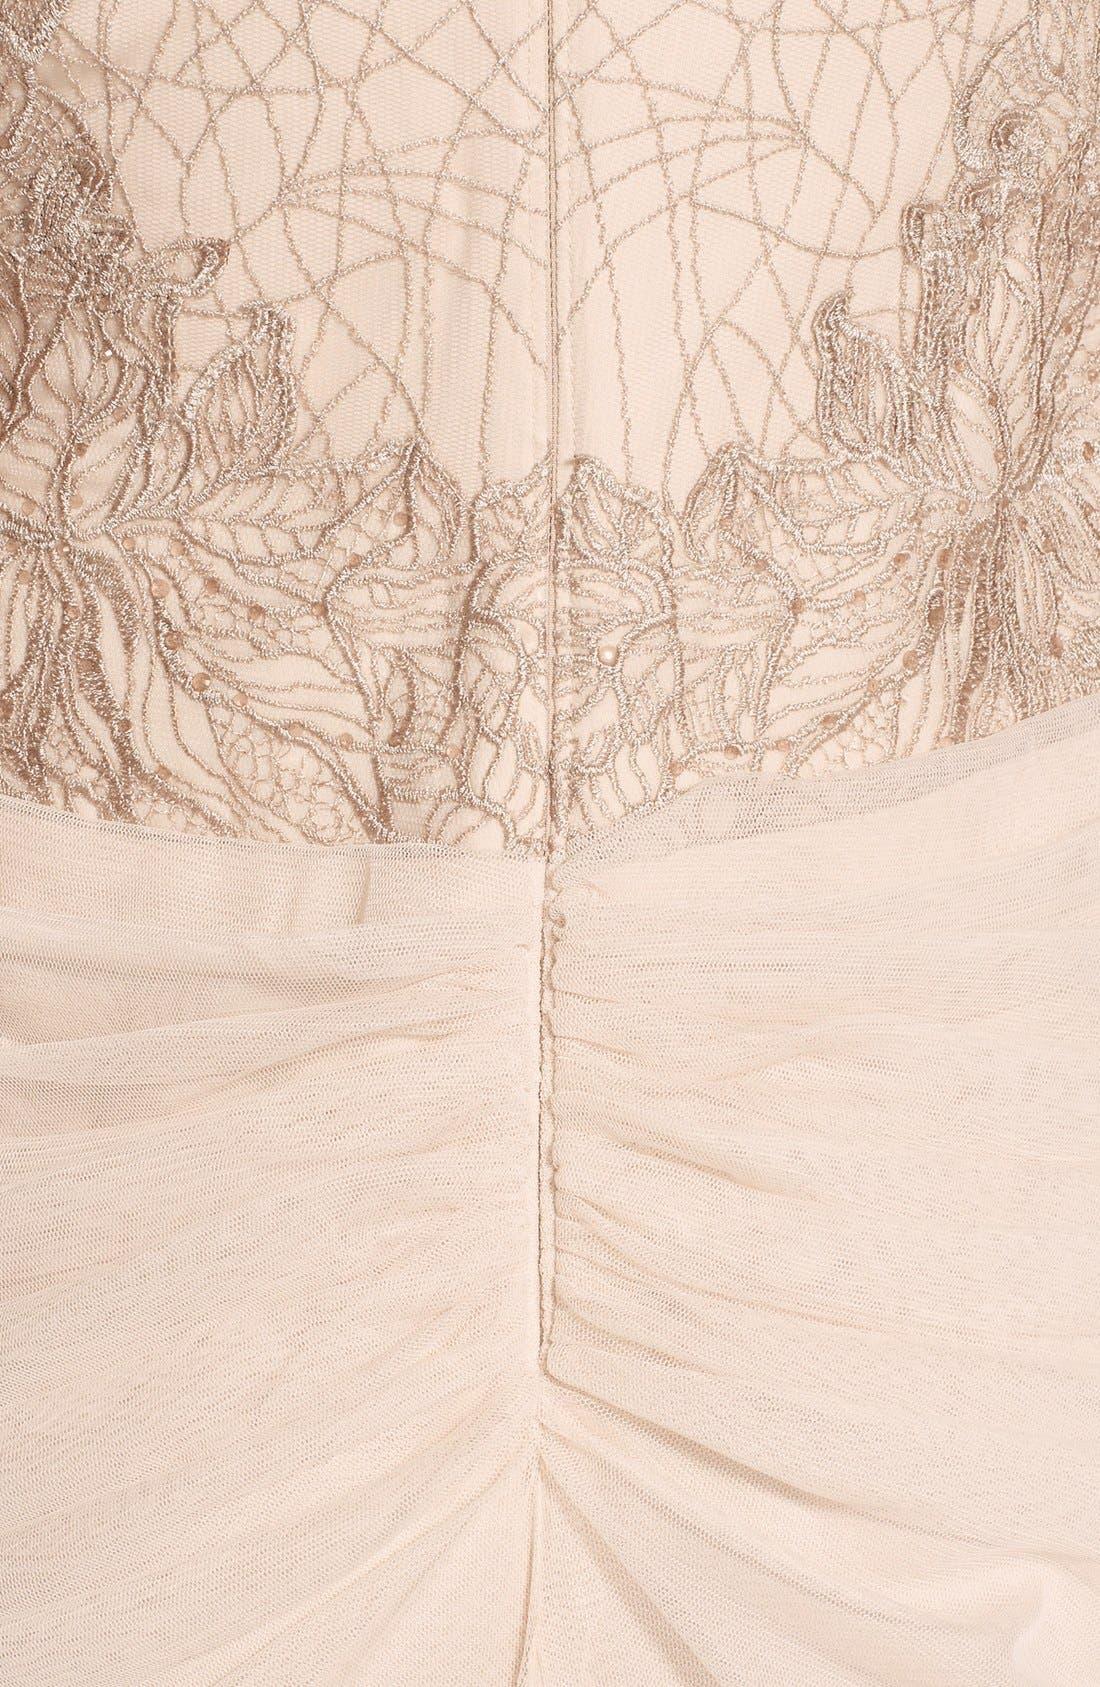 Alternate Image 3  - Tadashi Shoji Embroidered Tulle Gown